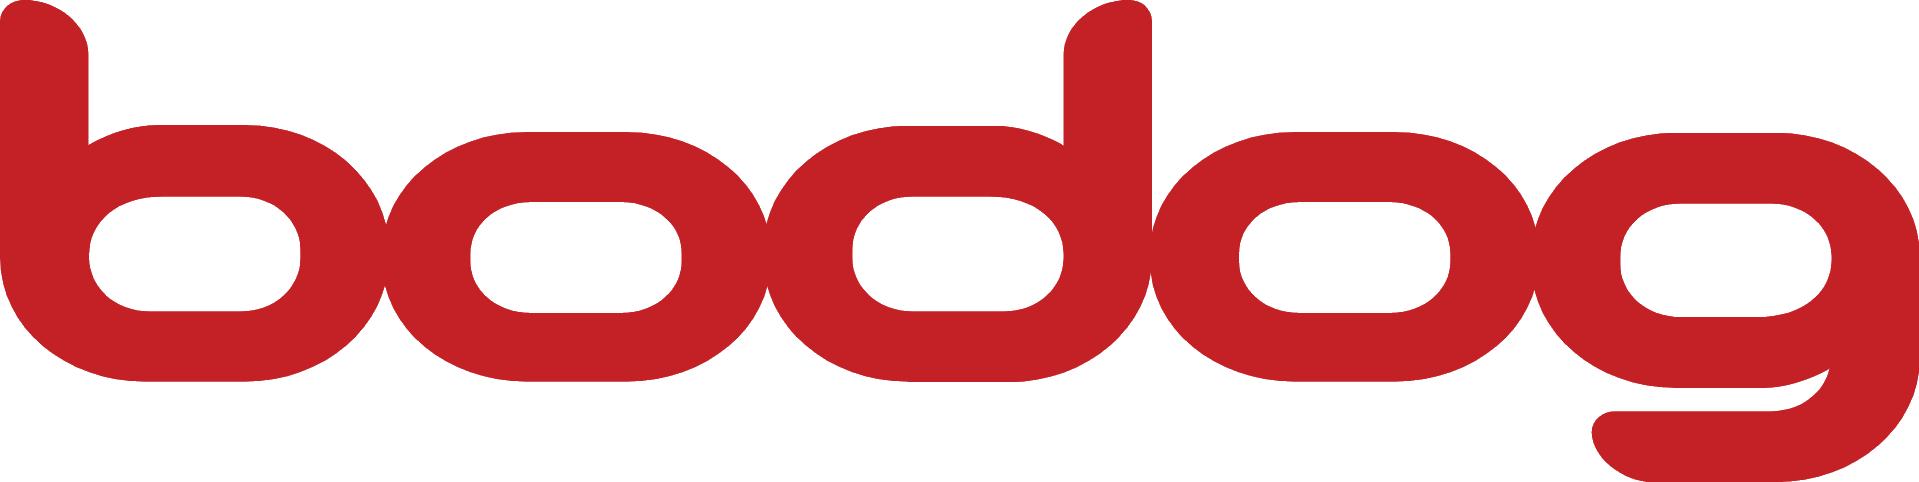 Bodog Brasil   Bônus de até USD 1.000   Análise 2020